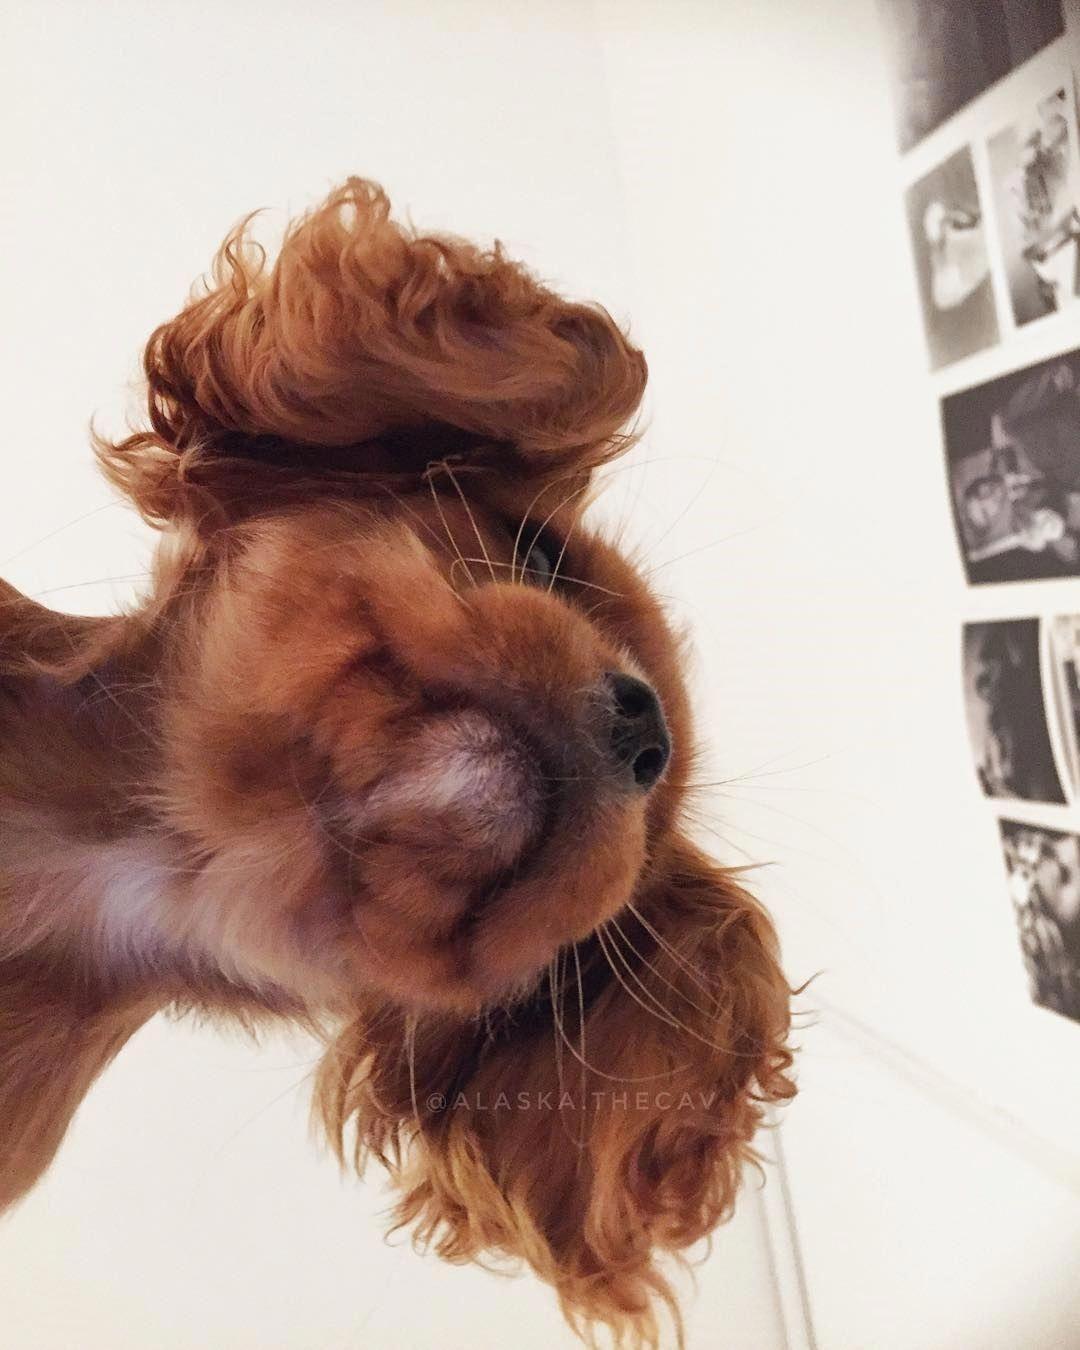 Cavalierkingcharlesspaniel King Charles Cavalier Spaniel Puppy Cavalier King Charles Dog Cavalier King Charles